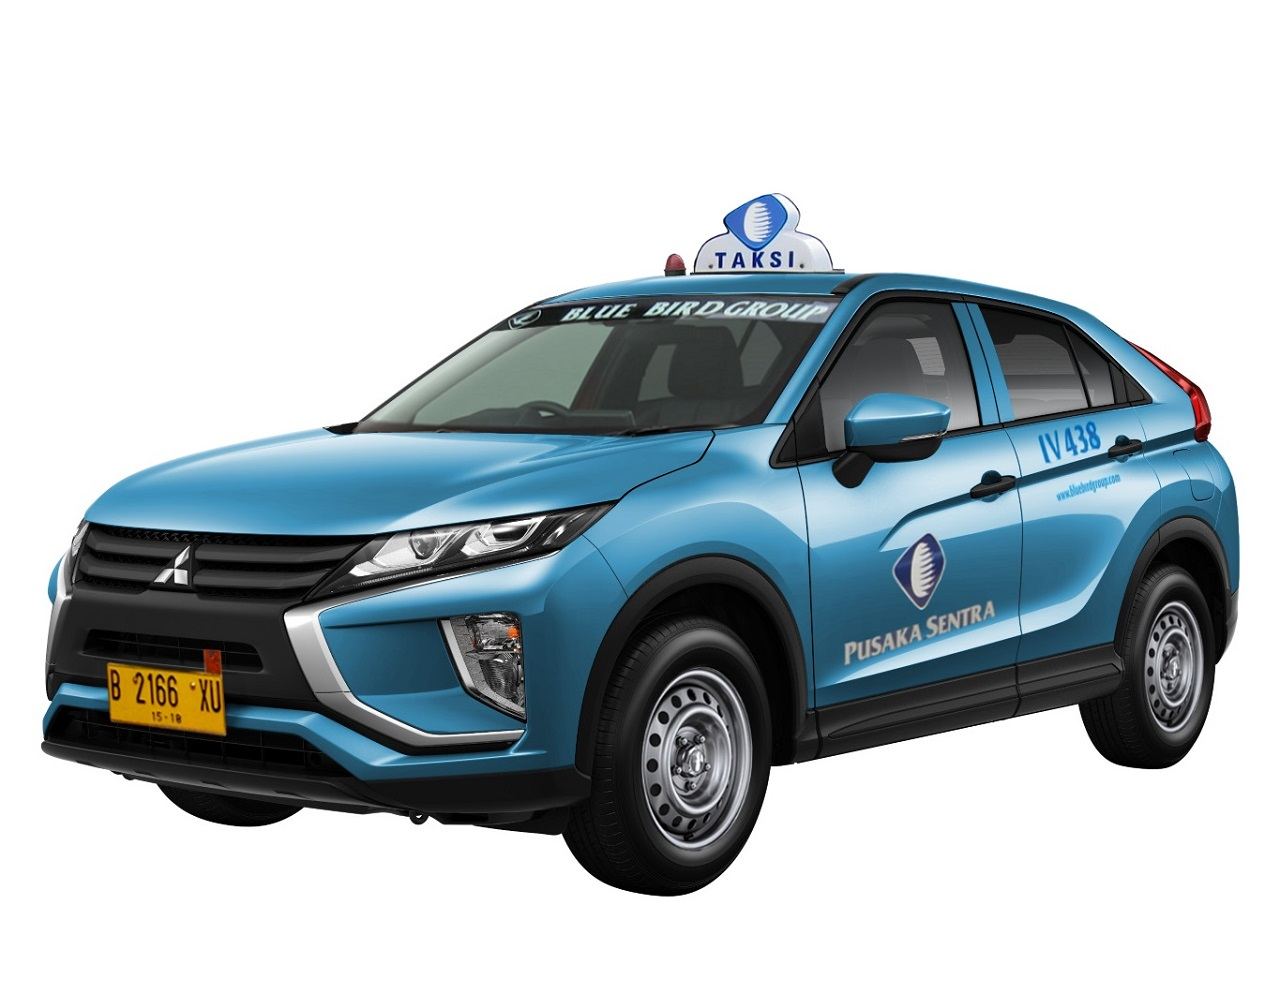 Mitsubishi Eclipse Cross Bluebird Group TAKSI ( TAXI ) !? ・・・・